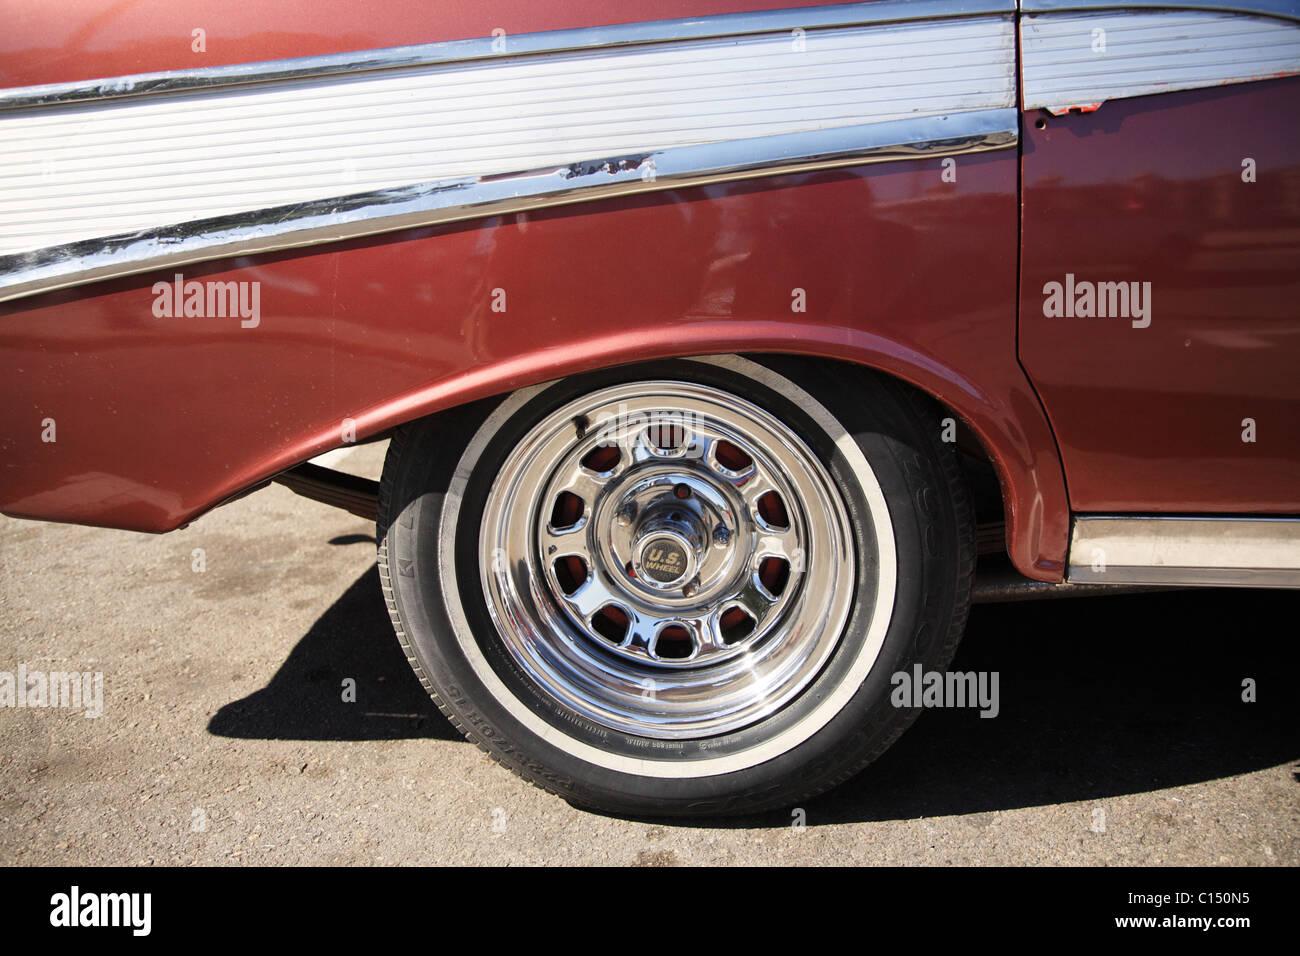 chrome wheel of an old american car in havana cuba